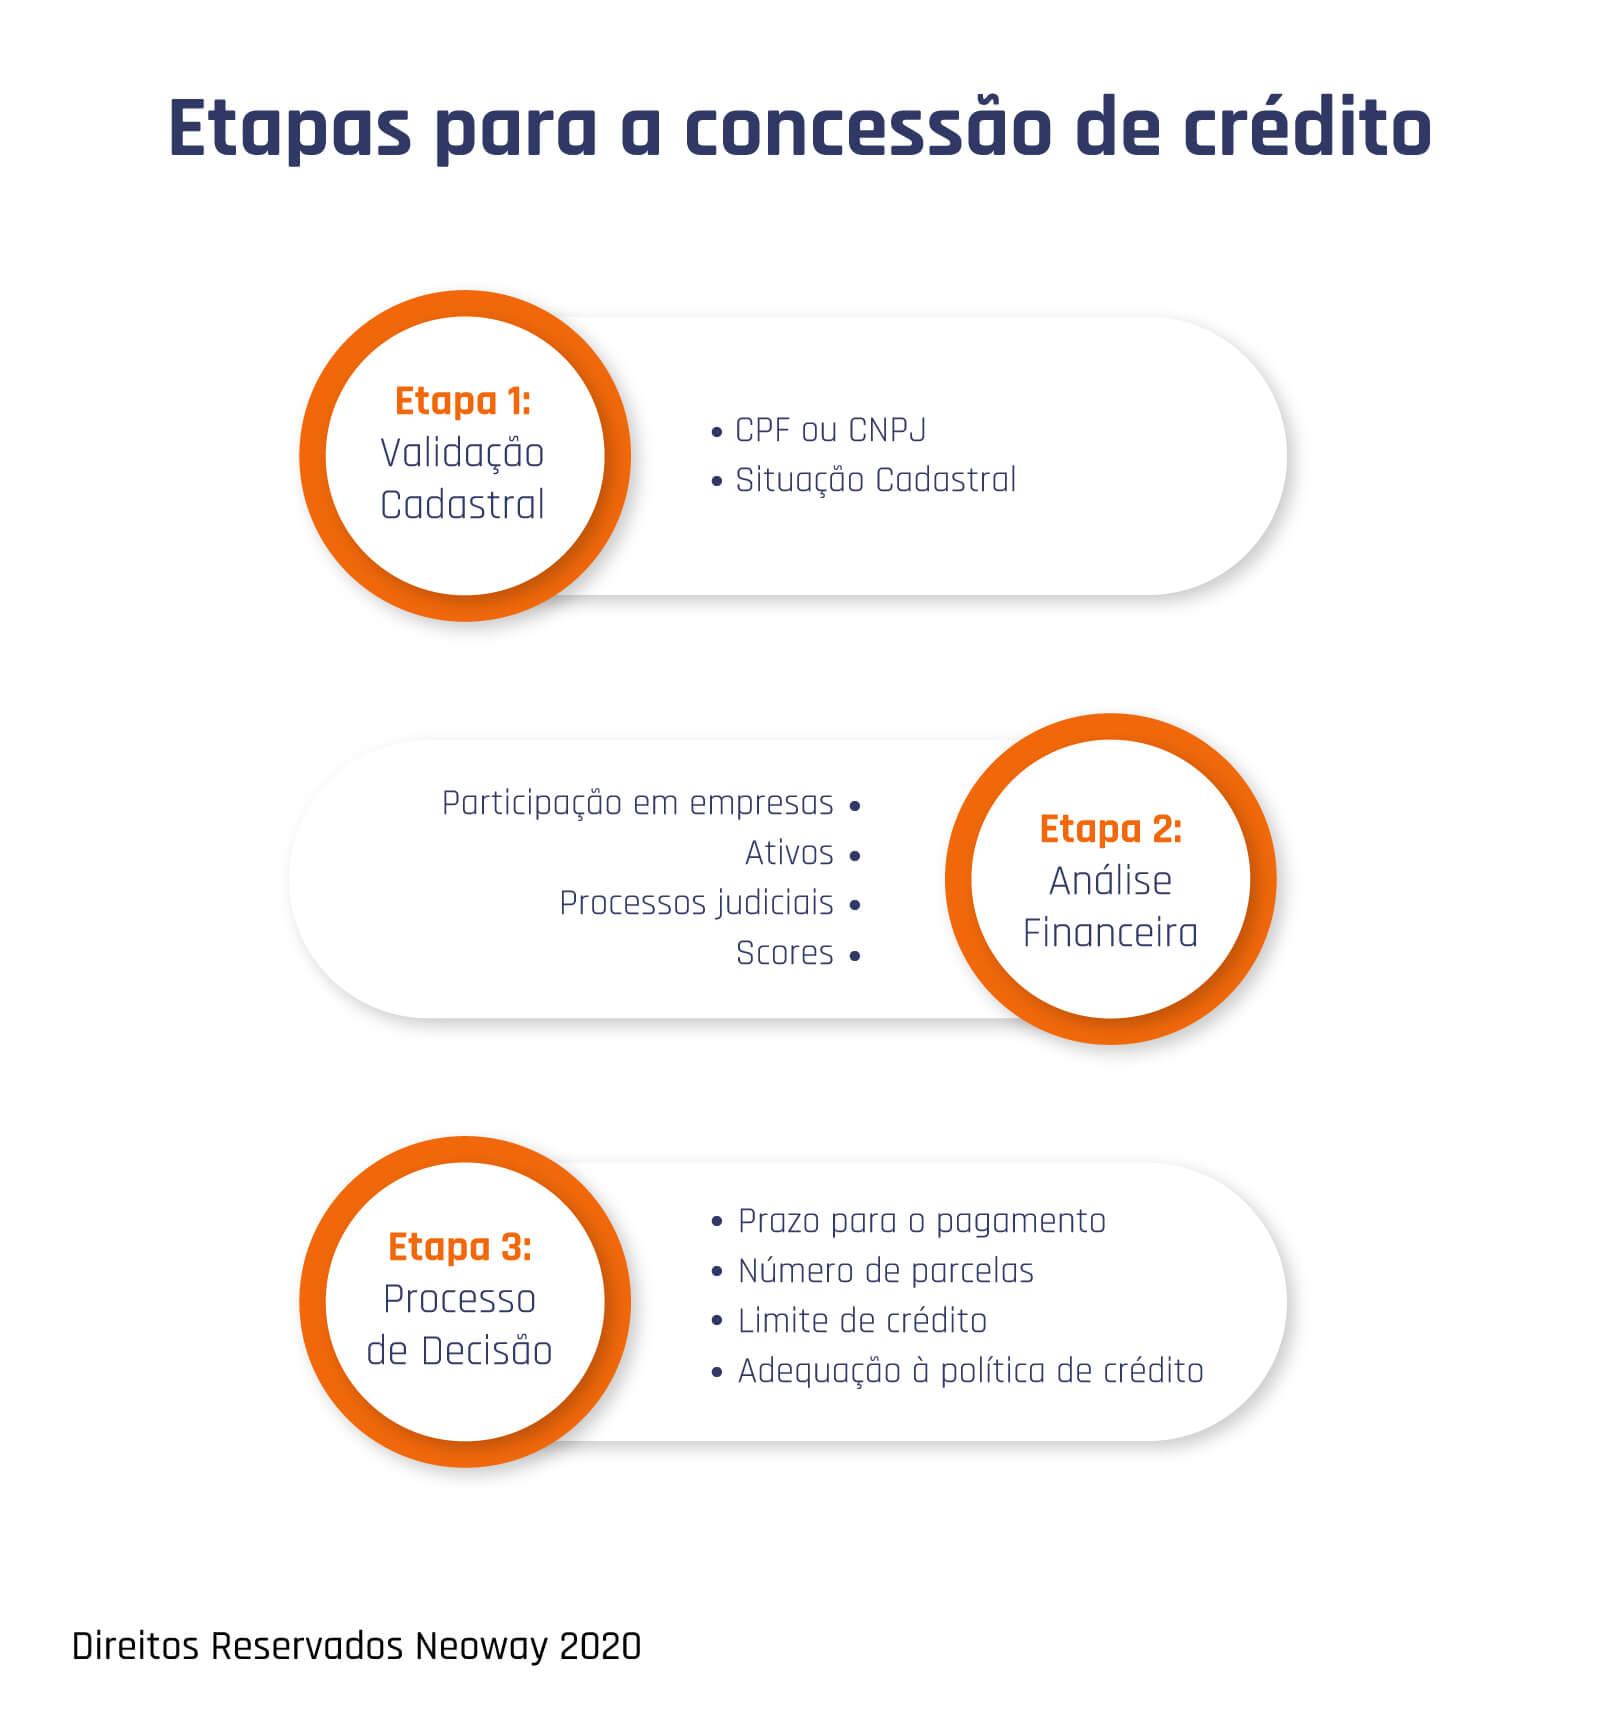 etapas para concessao de credito